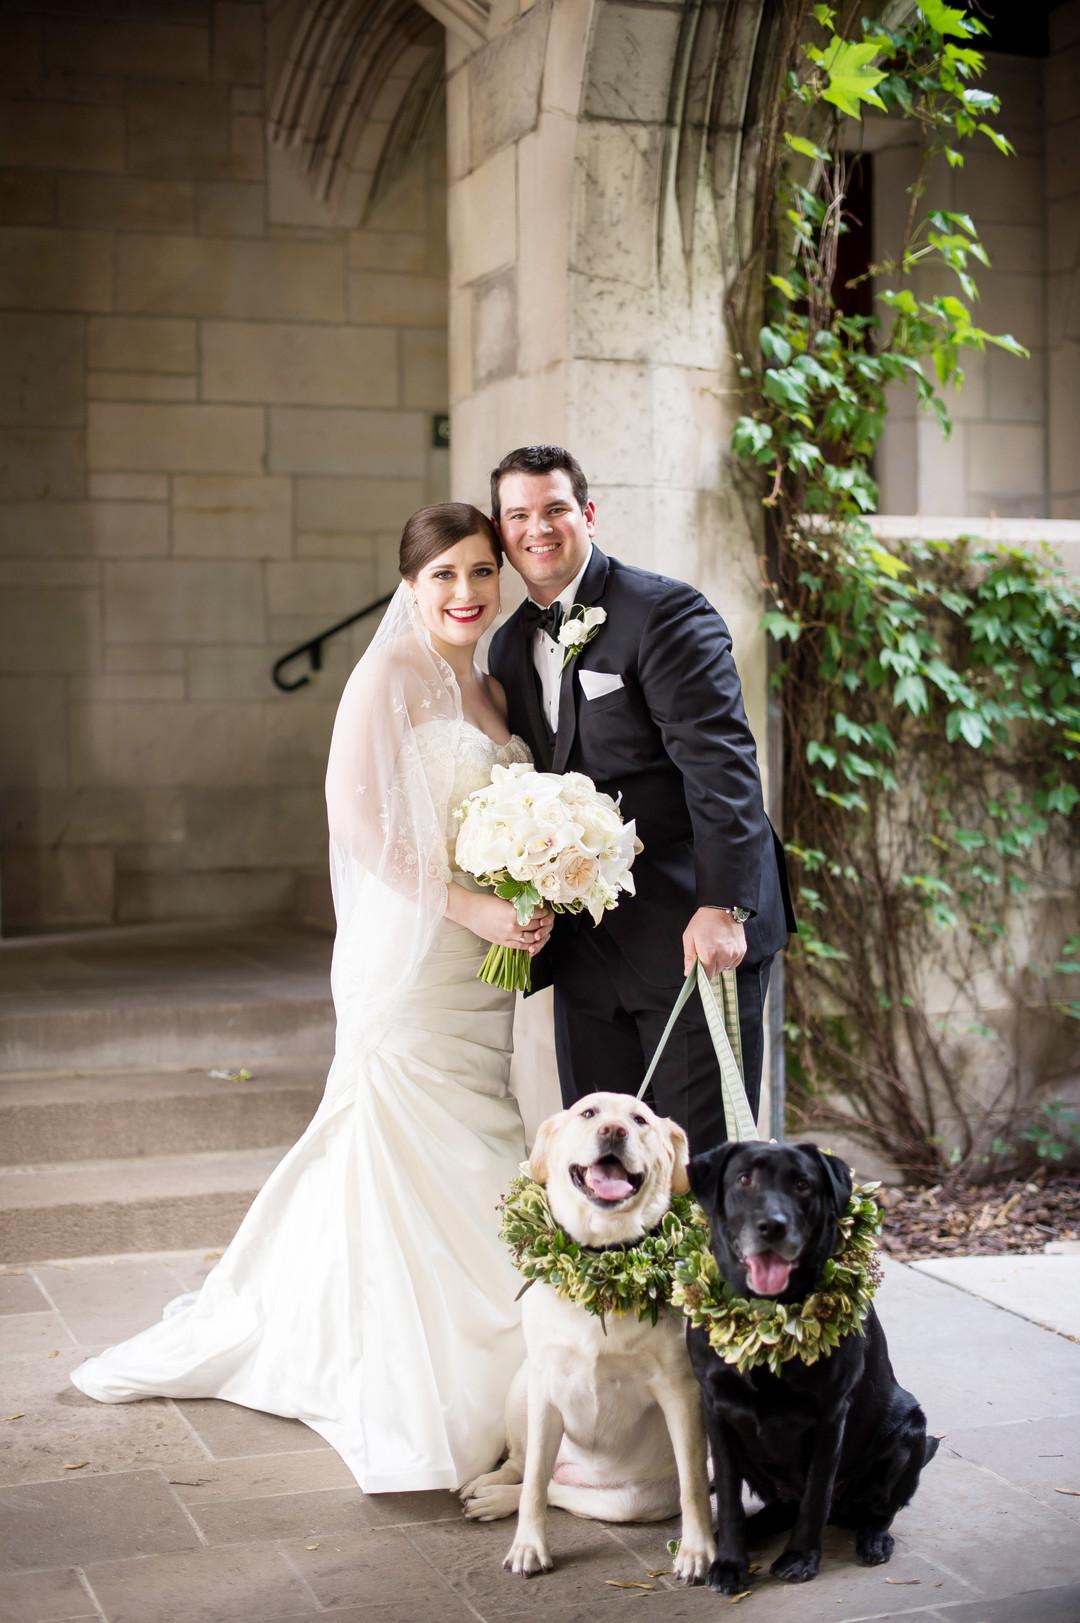 Bride, Groom and Pups Chicago Wedding Julia Franzosa Photography